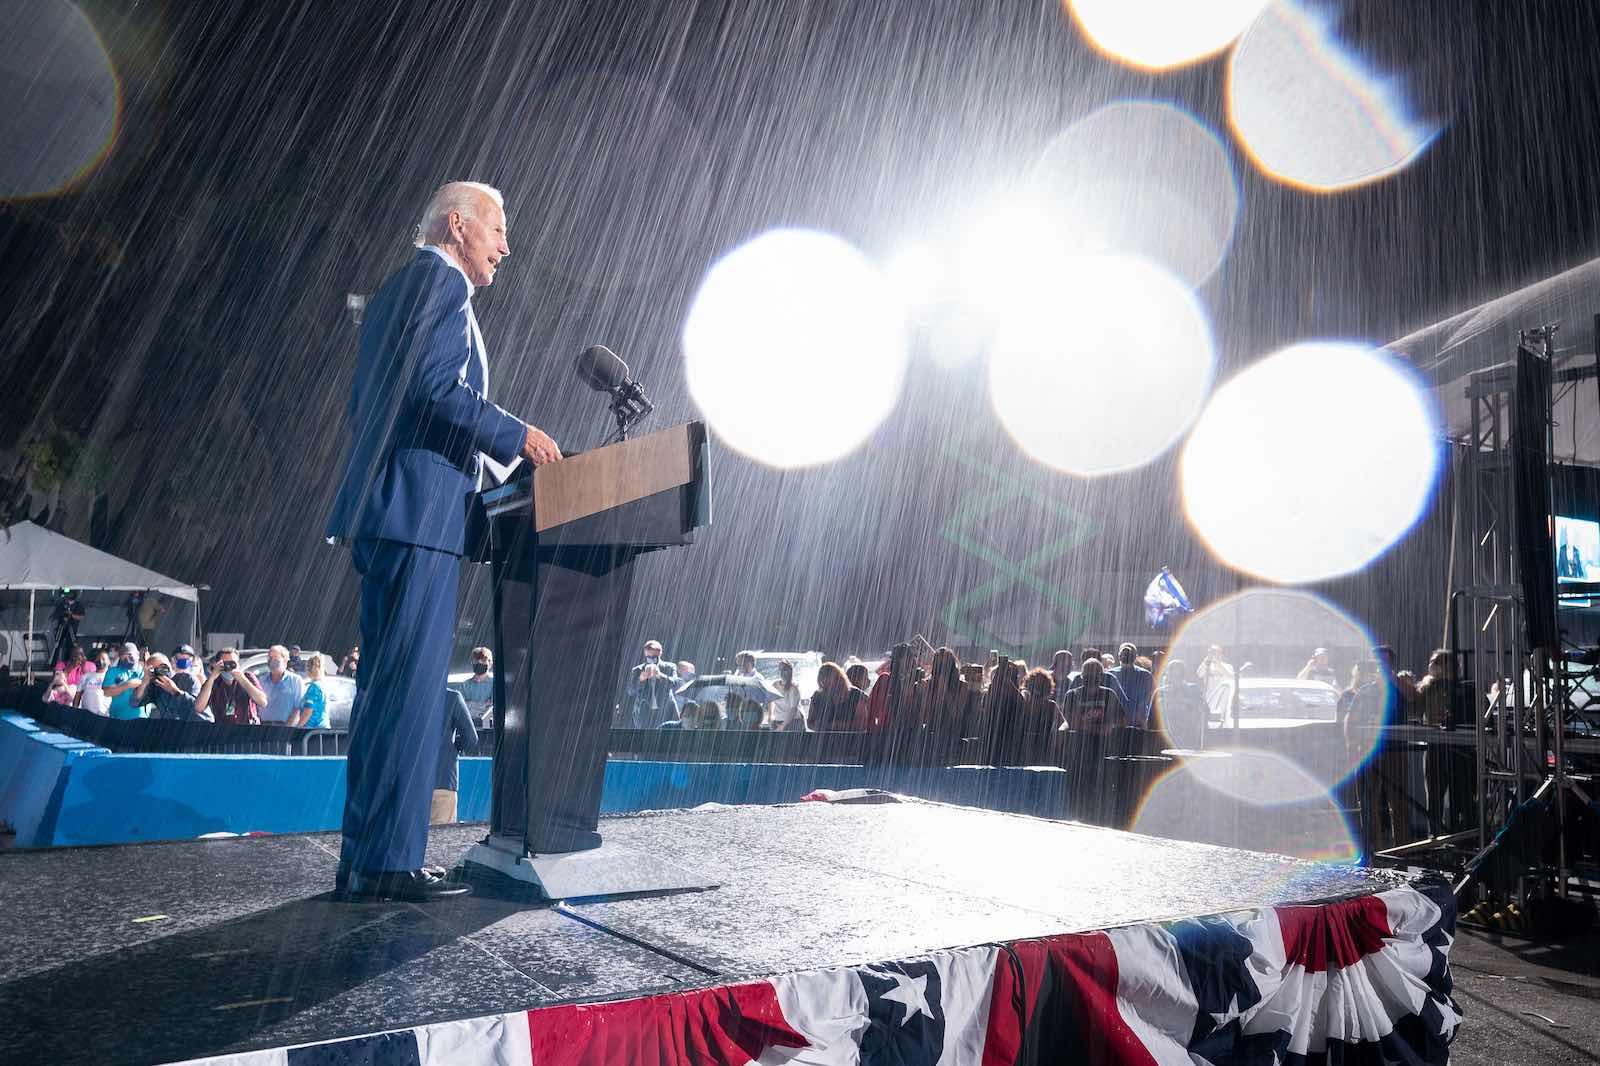 Joe Biden speaking at a campaign rally in Tampa, Florida, 29 October 2020 (Joe Biden/Flickr)